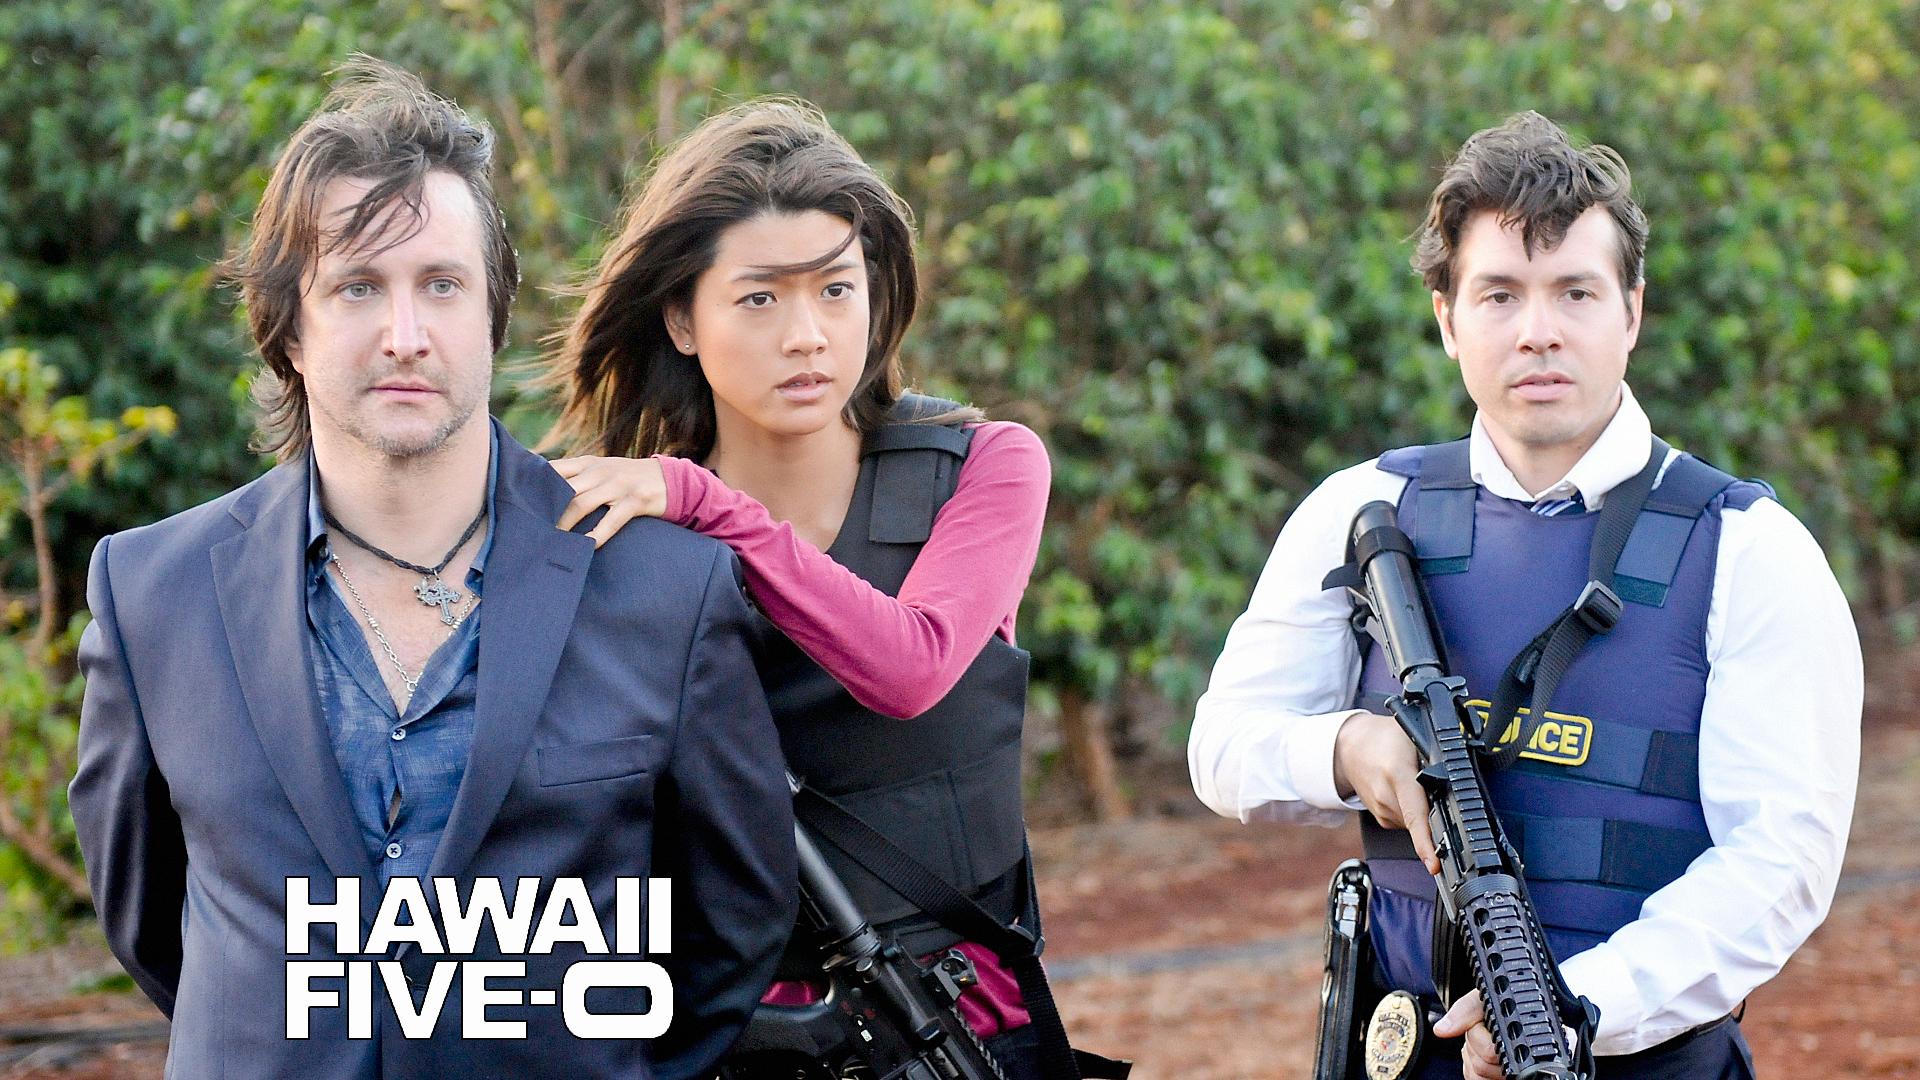 http://thumbnails.cbsig.net/CBS_Production_Entertainment/CBS_Production_Entertainment/2010/11/08/Primetime/Hawaii_Five-0/Season_1/Full_Episodes/536/960/CBS_HAWAII_107_IMAGE_CIAN.jpg